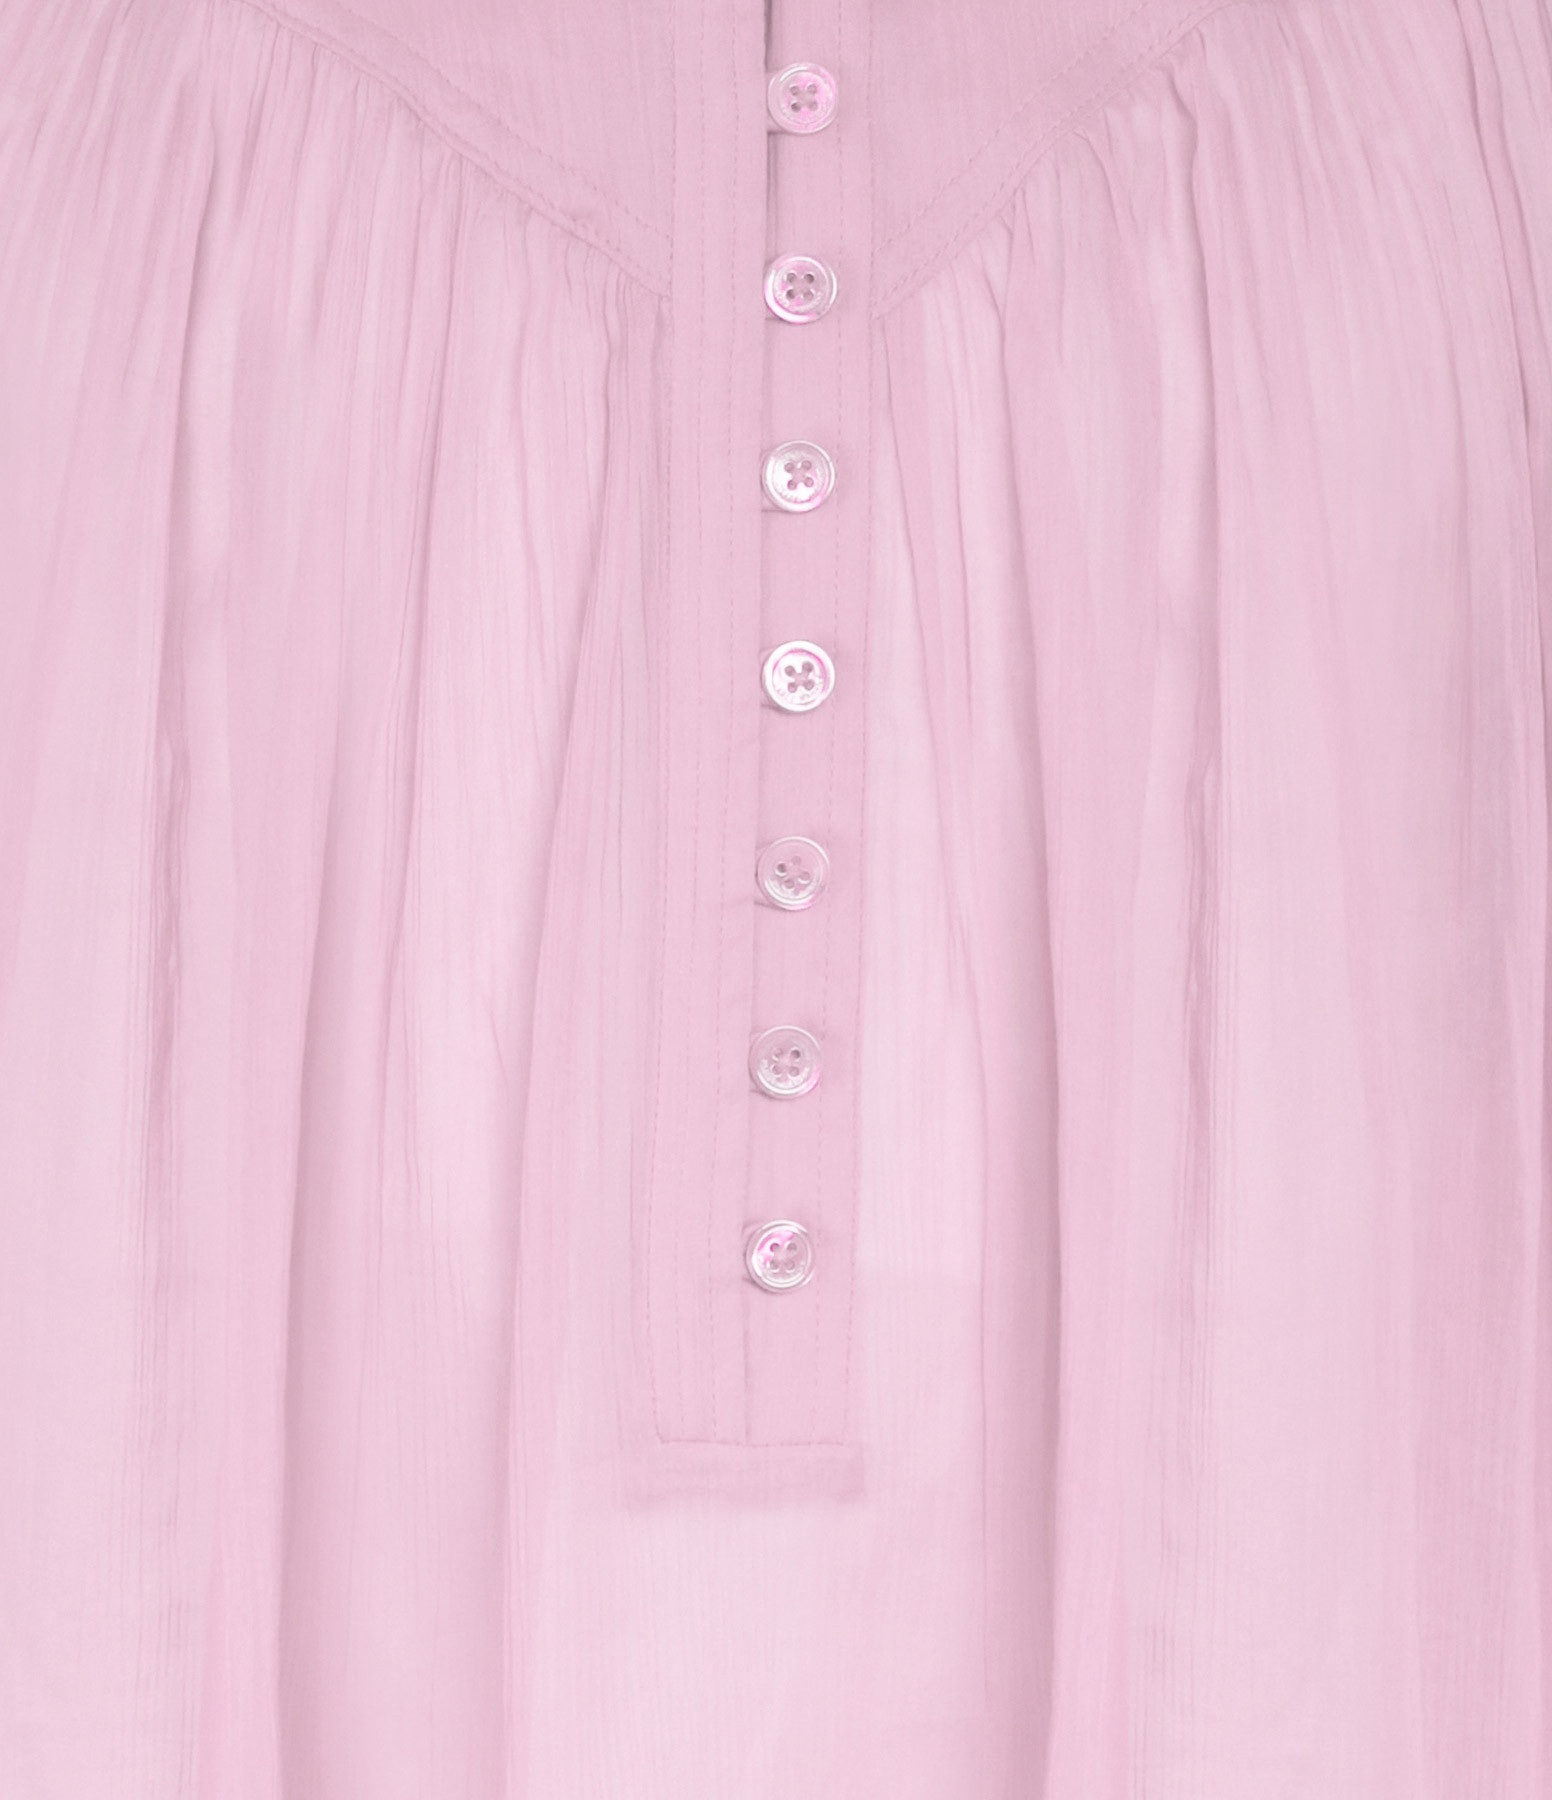 ISABEL MARANT - Top Kiledia Soie Coton Rose Clair